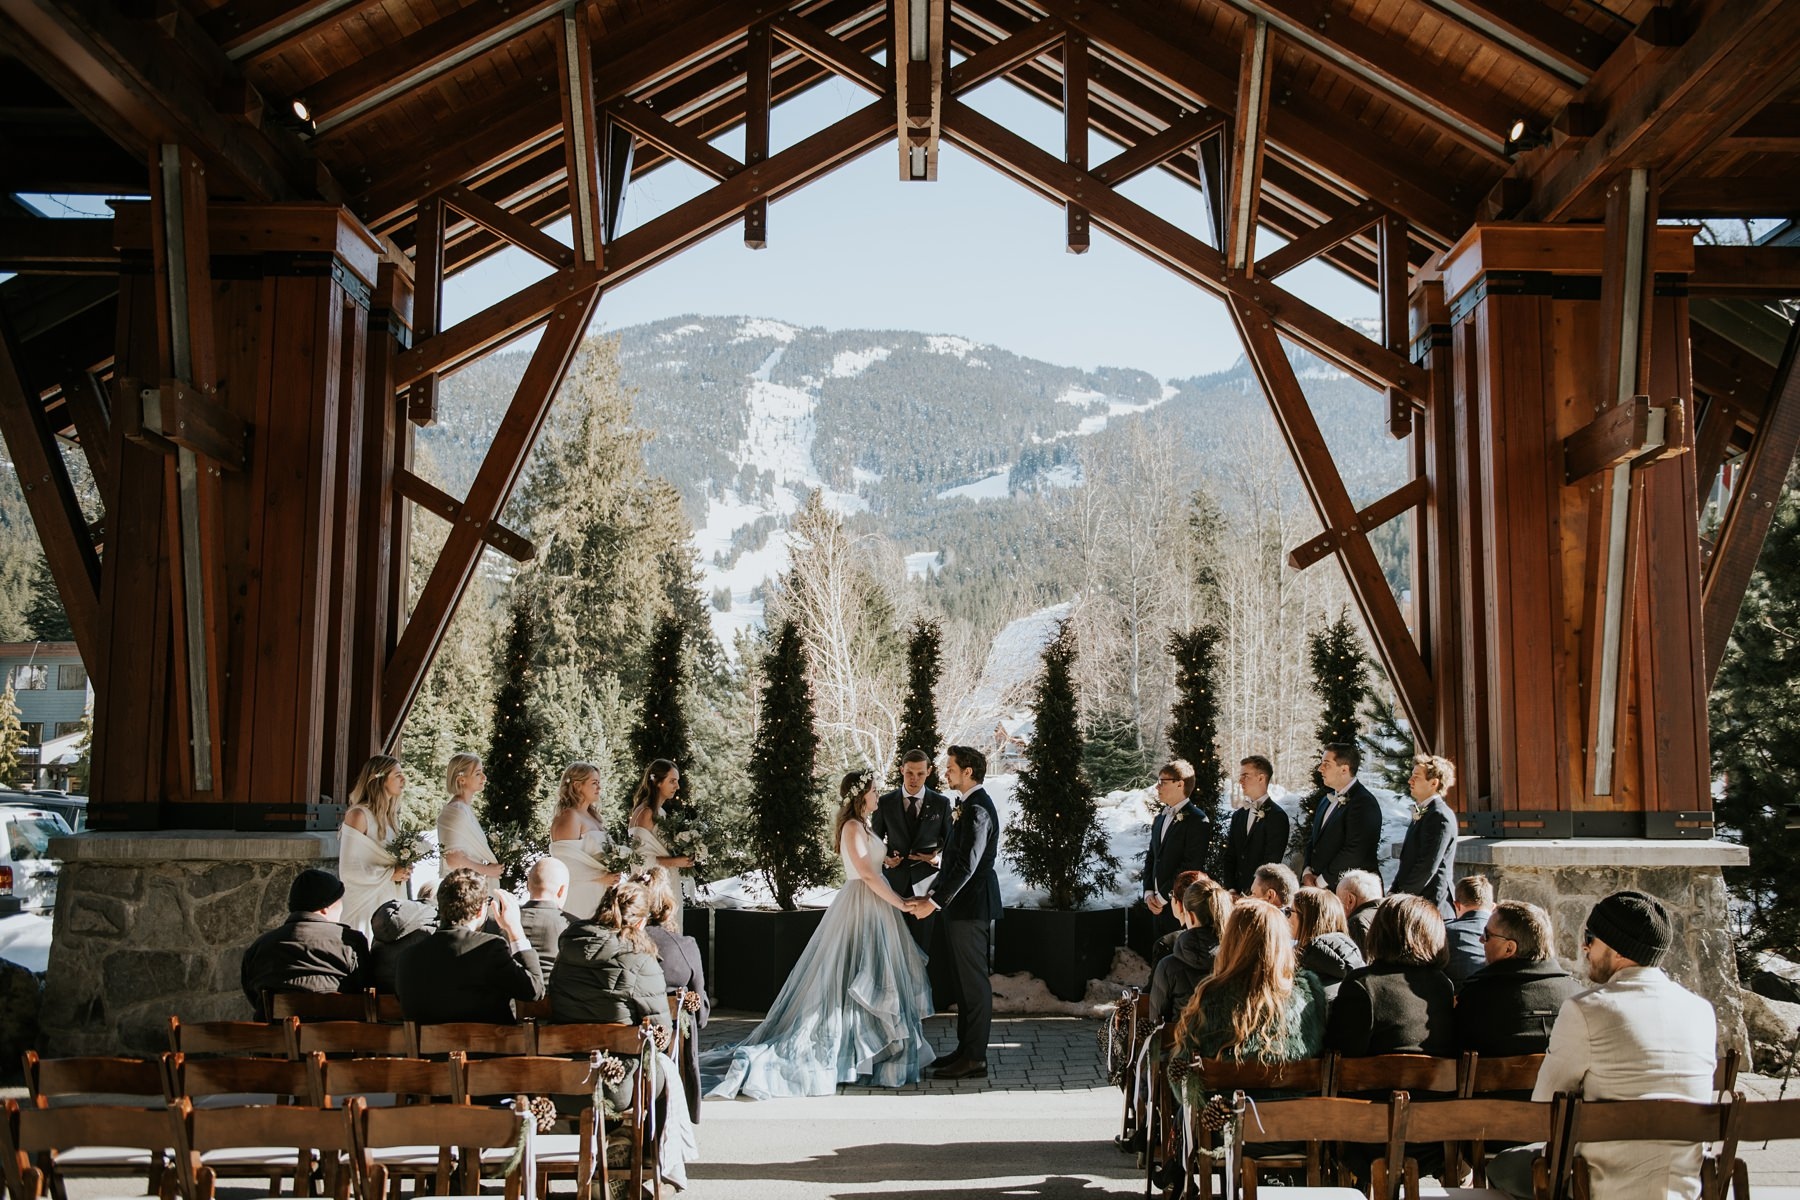 outdoor wedding ceremony at Nita lake lodge